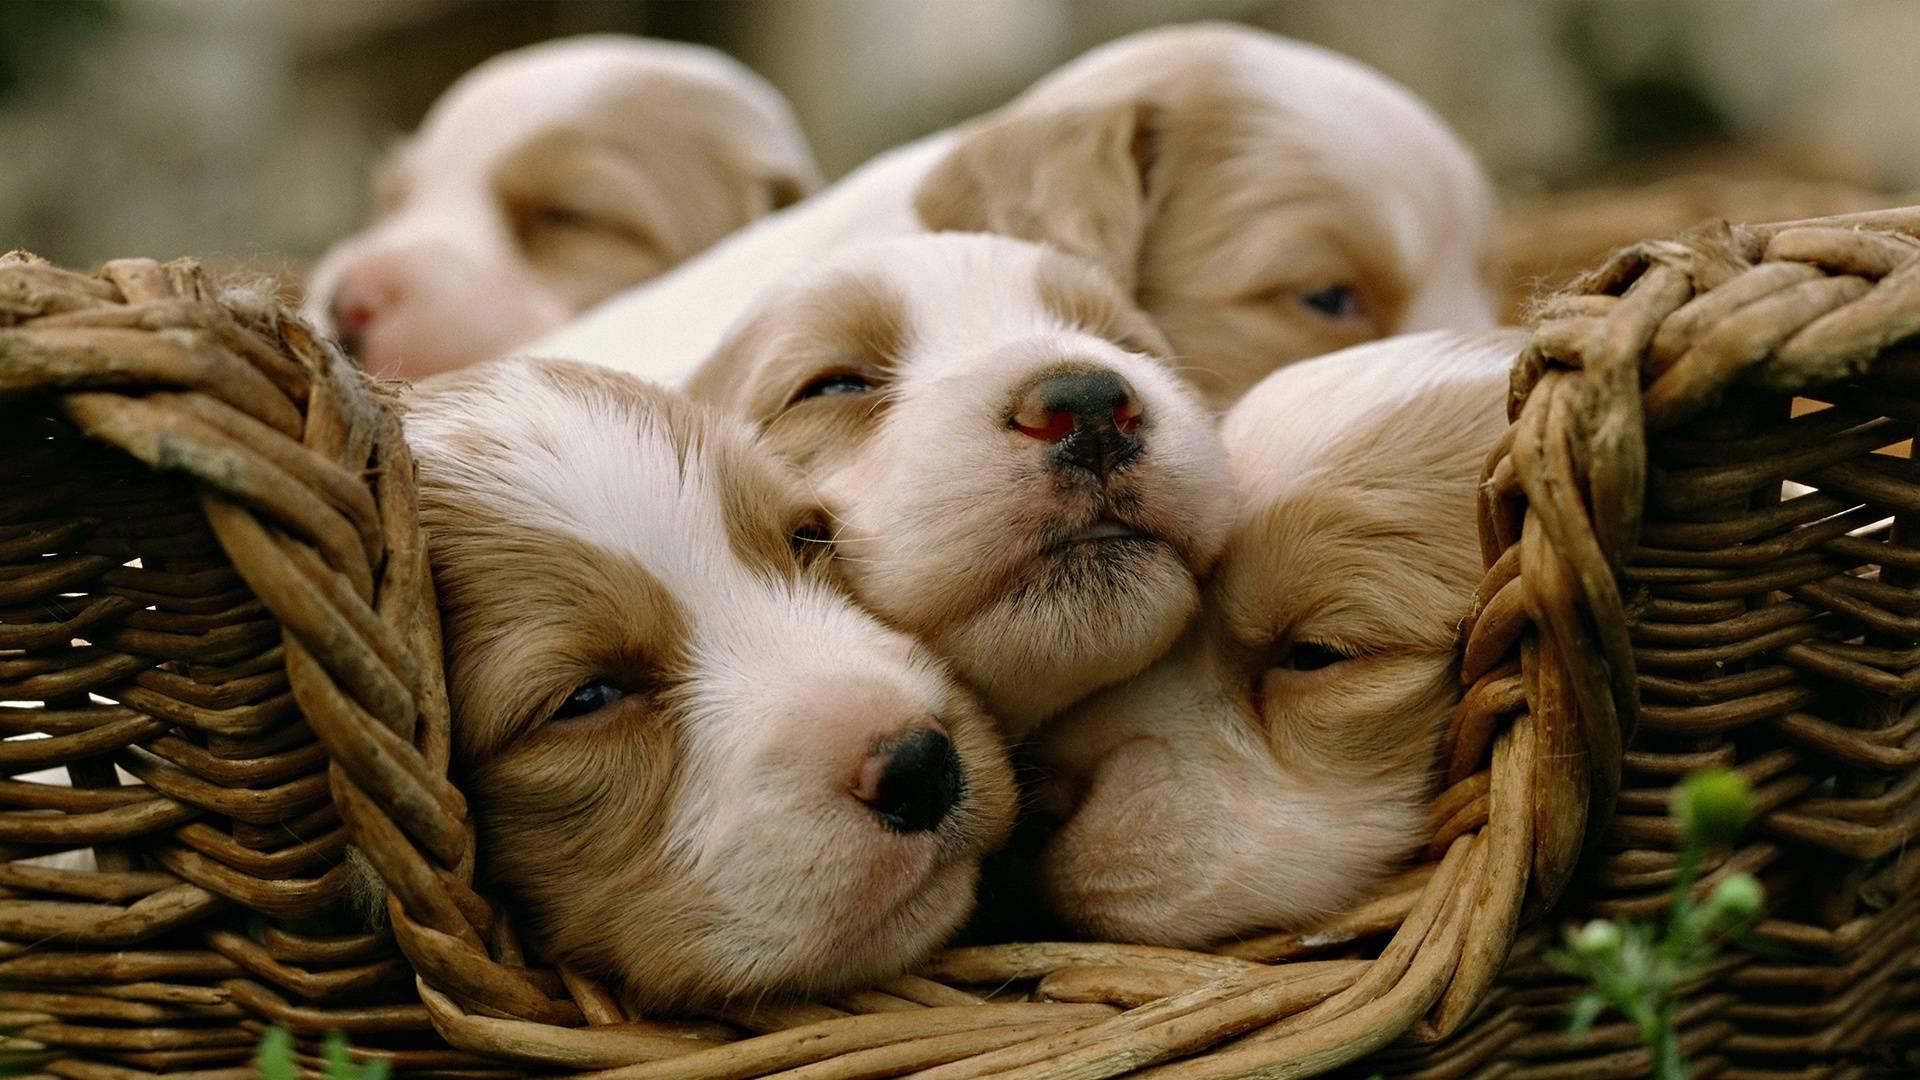 обои щенки в корзинке картинки фото